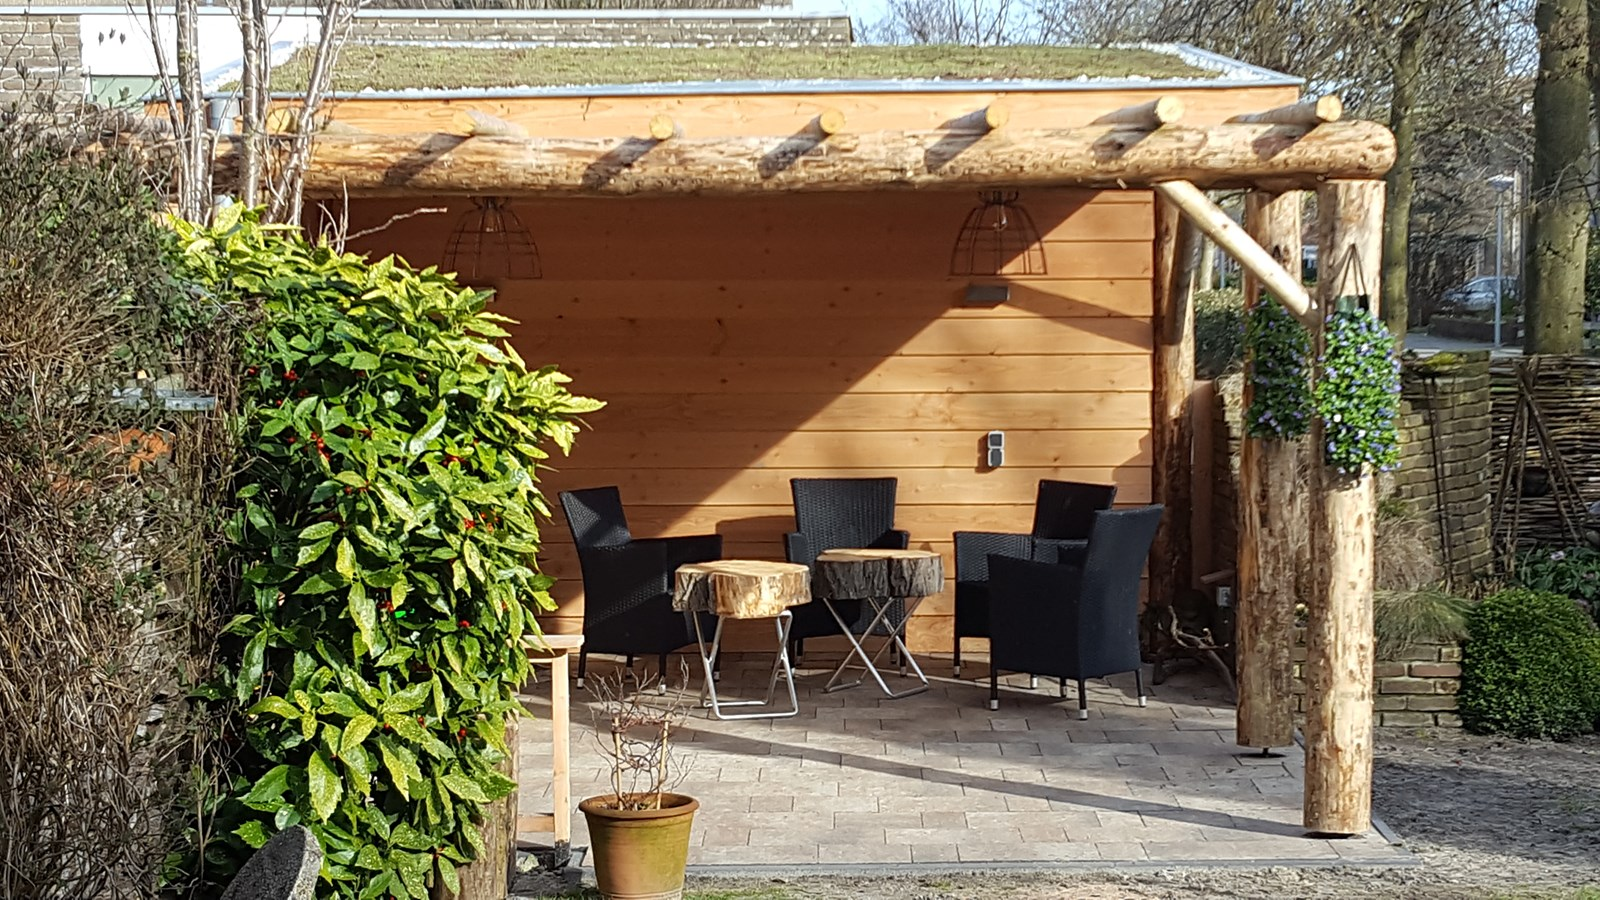 Project schitterende veranda met sedum dak - Dak van pergola ...